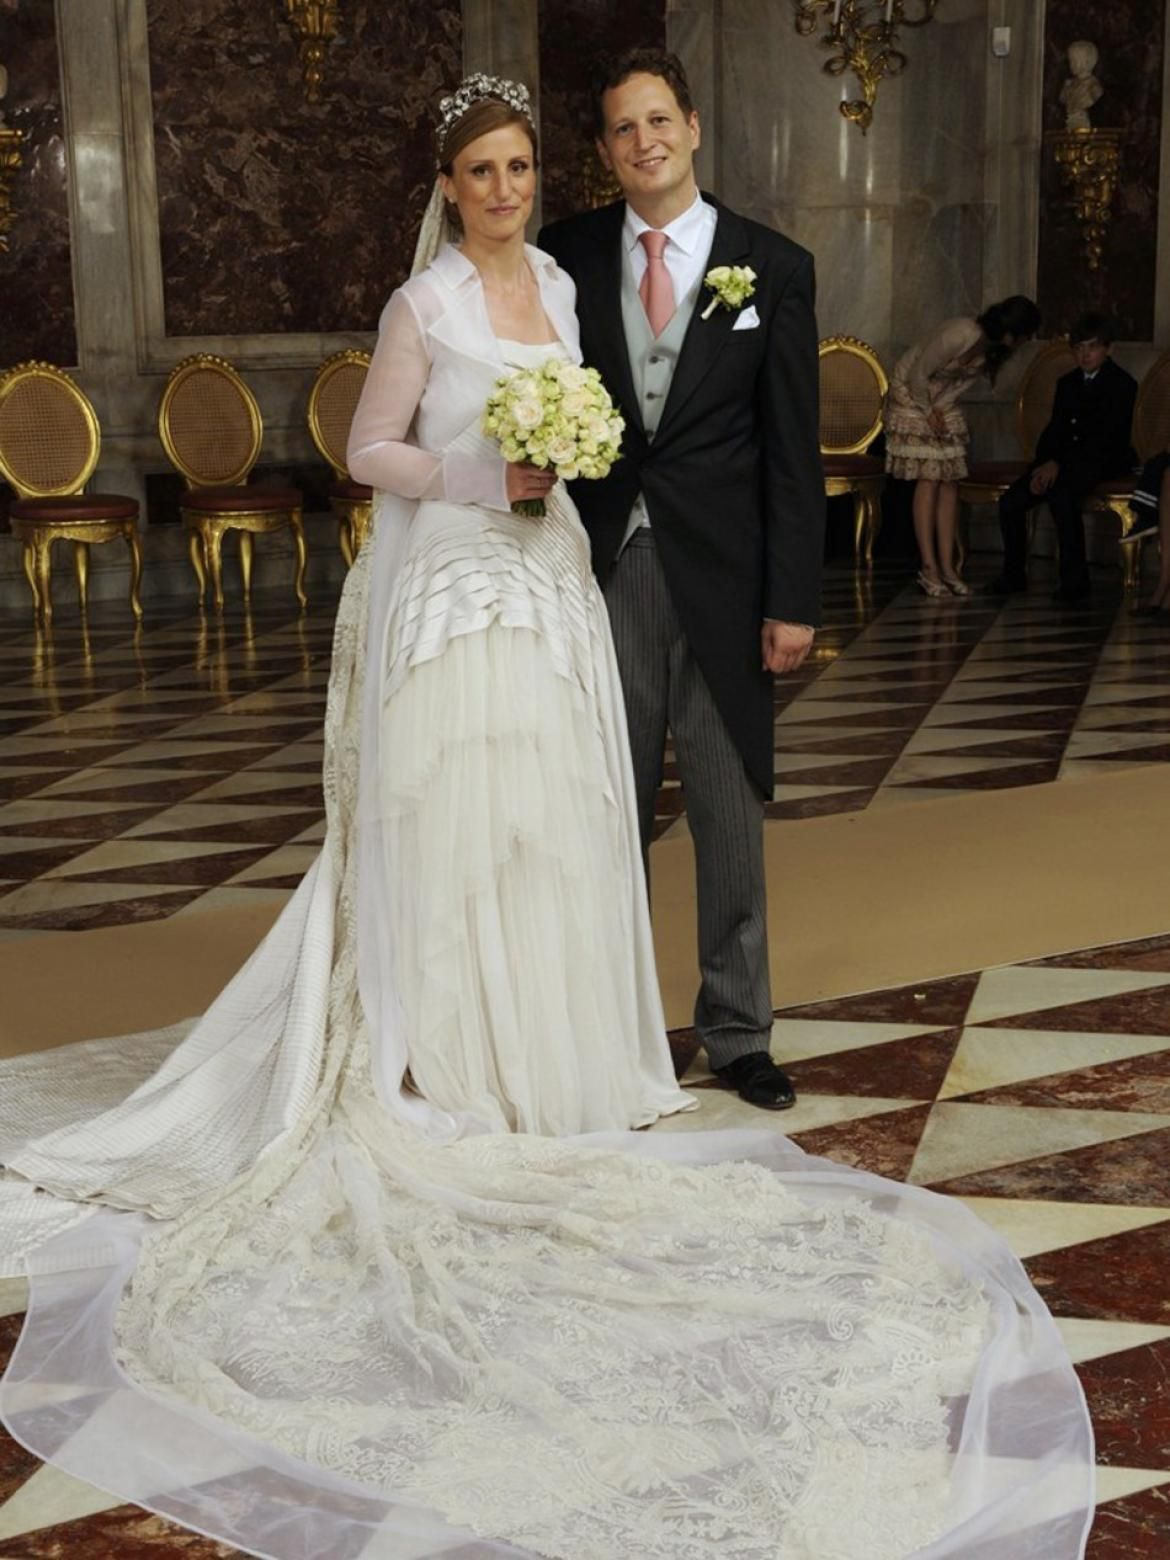 German Royal Wedding Prince Georg And Princess Sophie Tie The Knot Photos Royale Hochzeiten Braut Portraits Braut